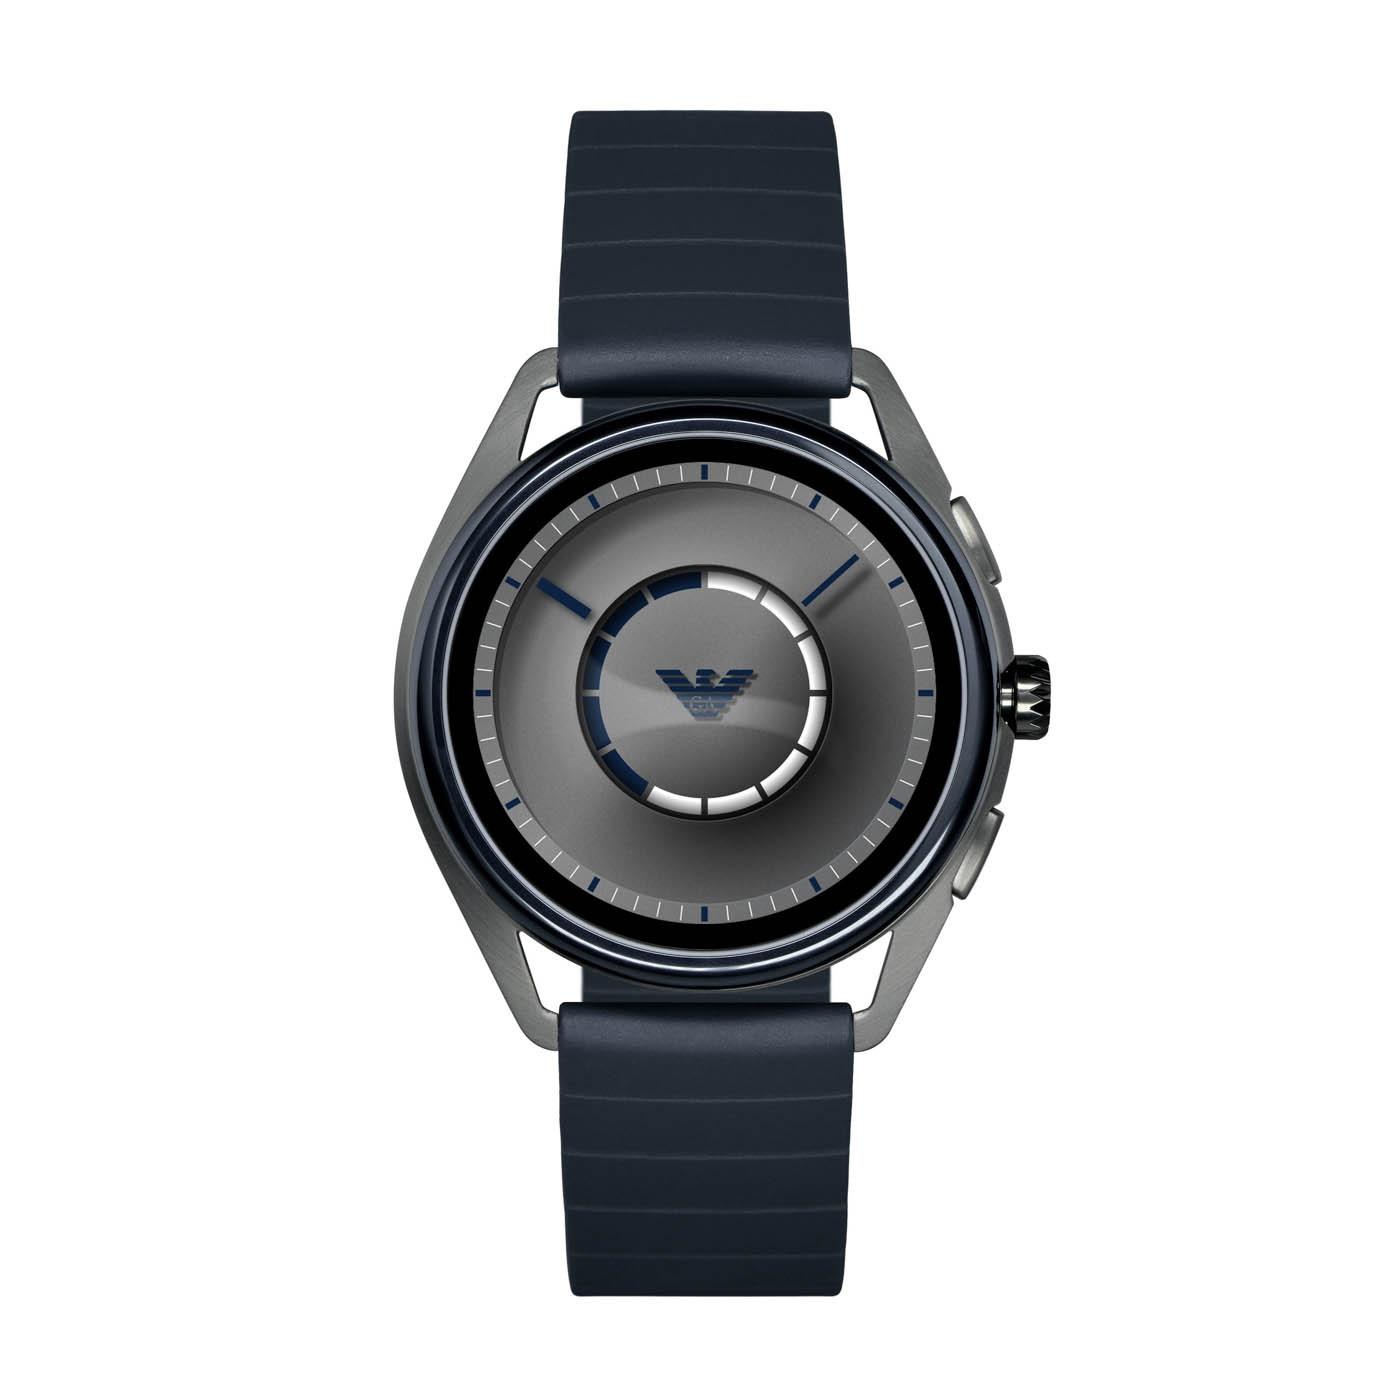 Emporio Armani Connected Matteo Gen 4 Display Smartwatch ART5008